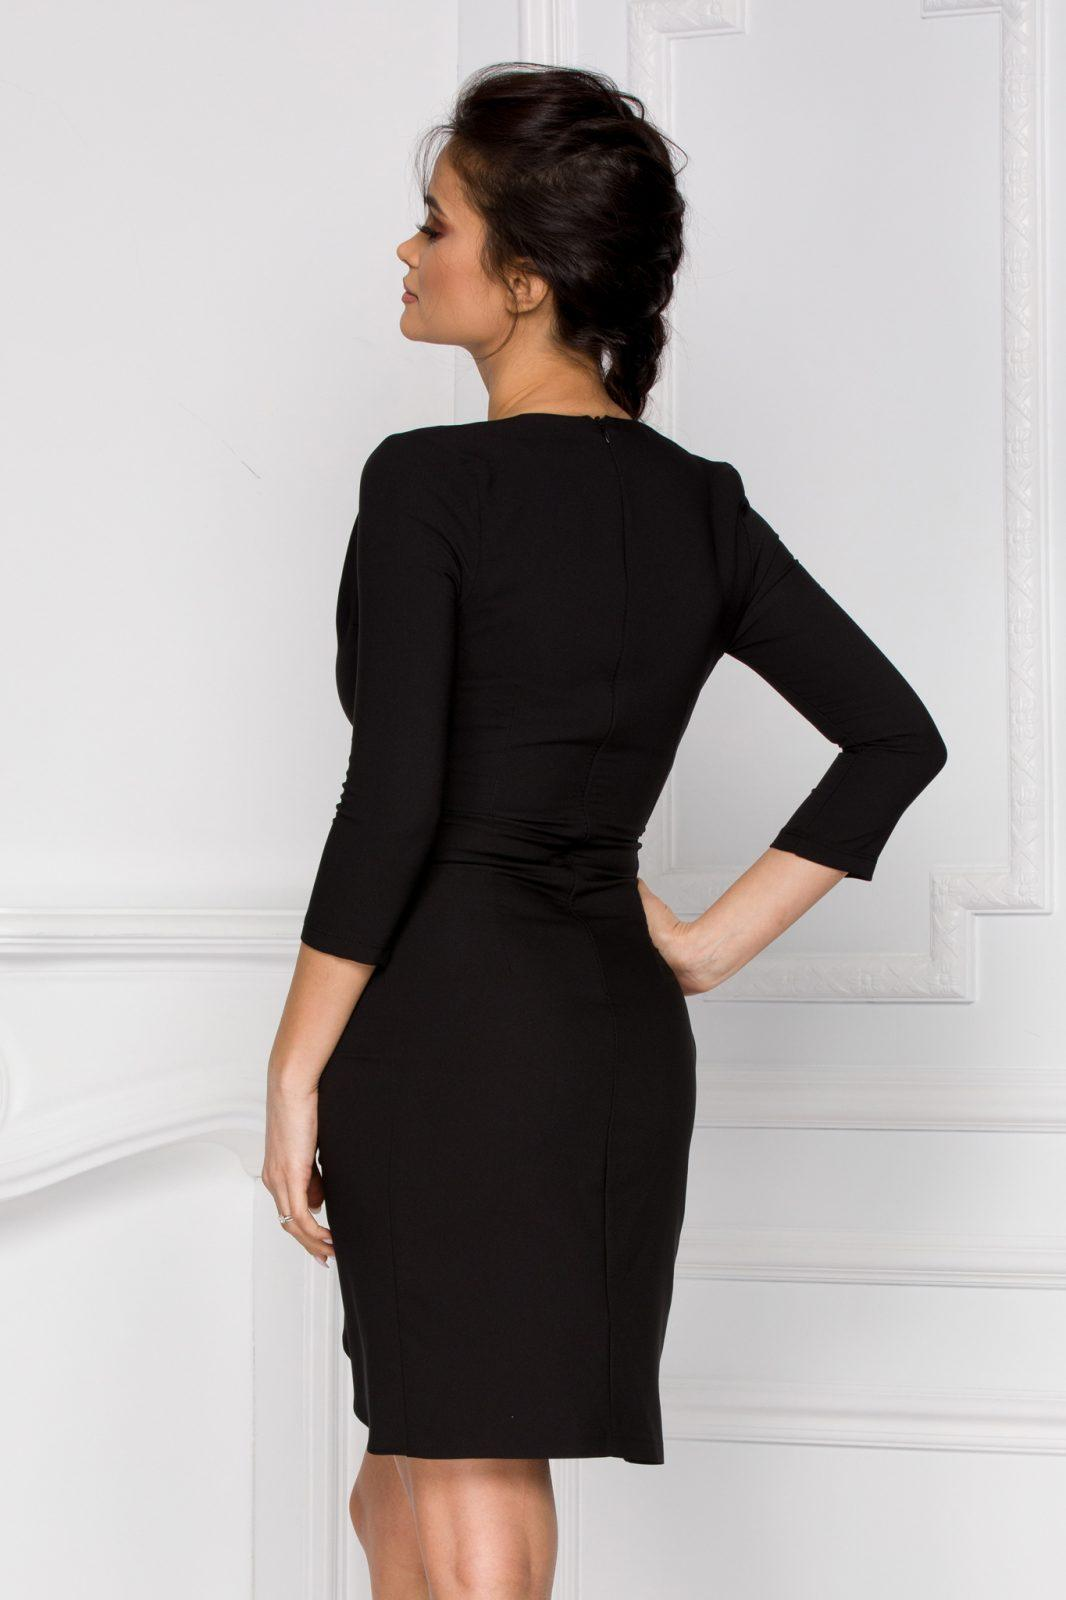 Passion Βραδινό Φόρεμα 5935